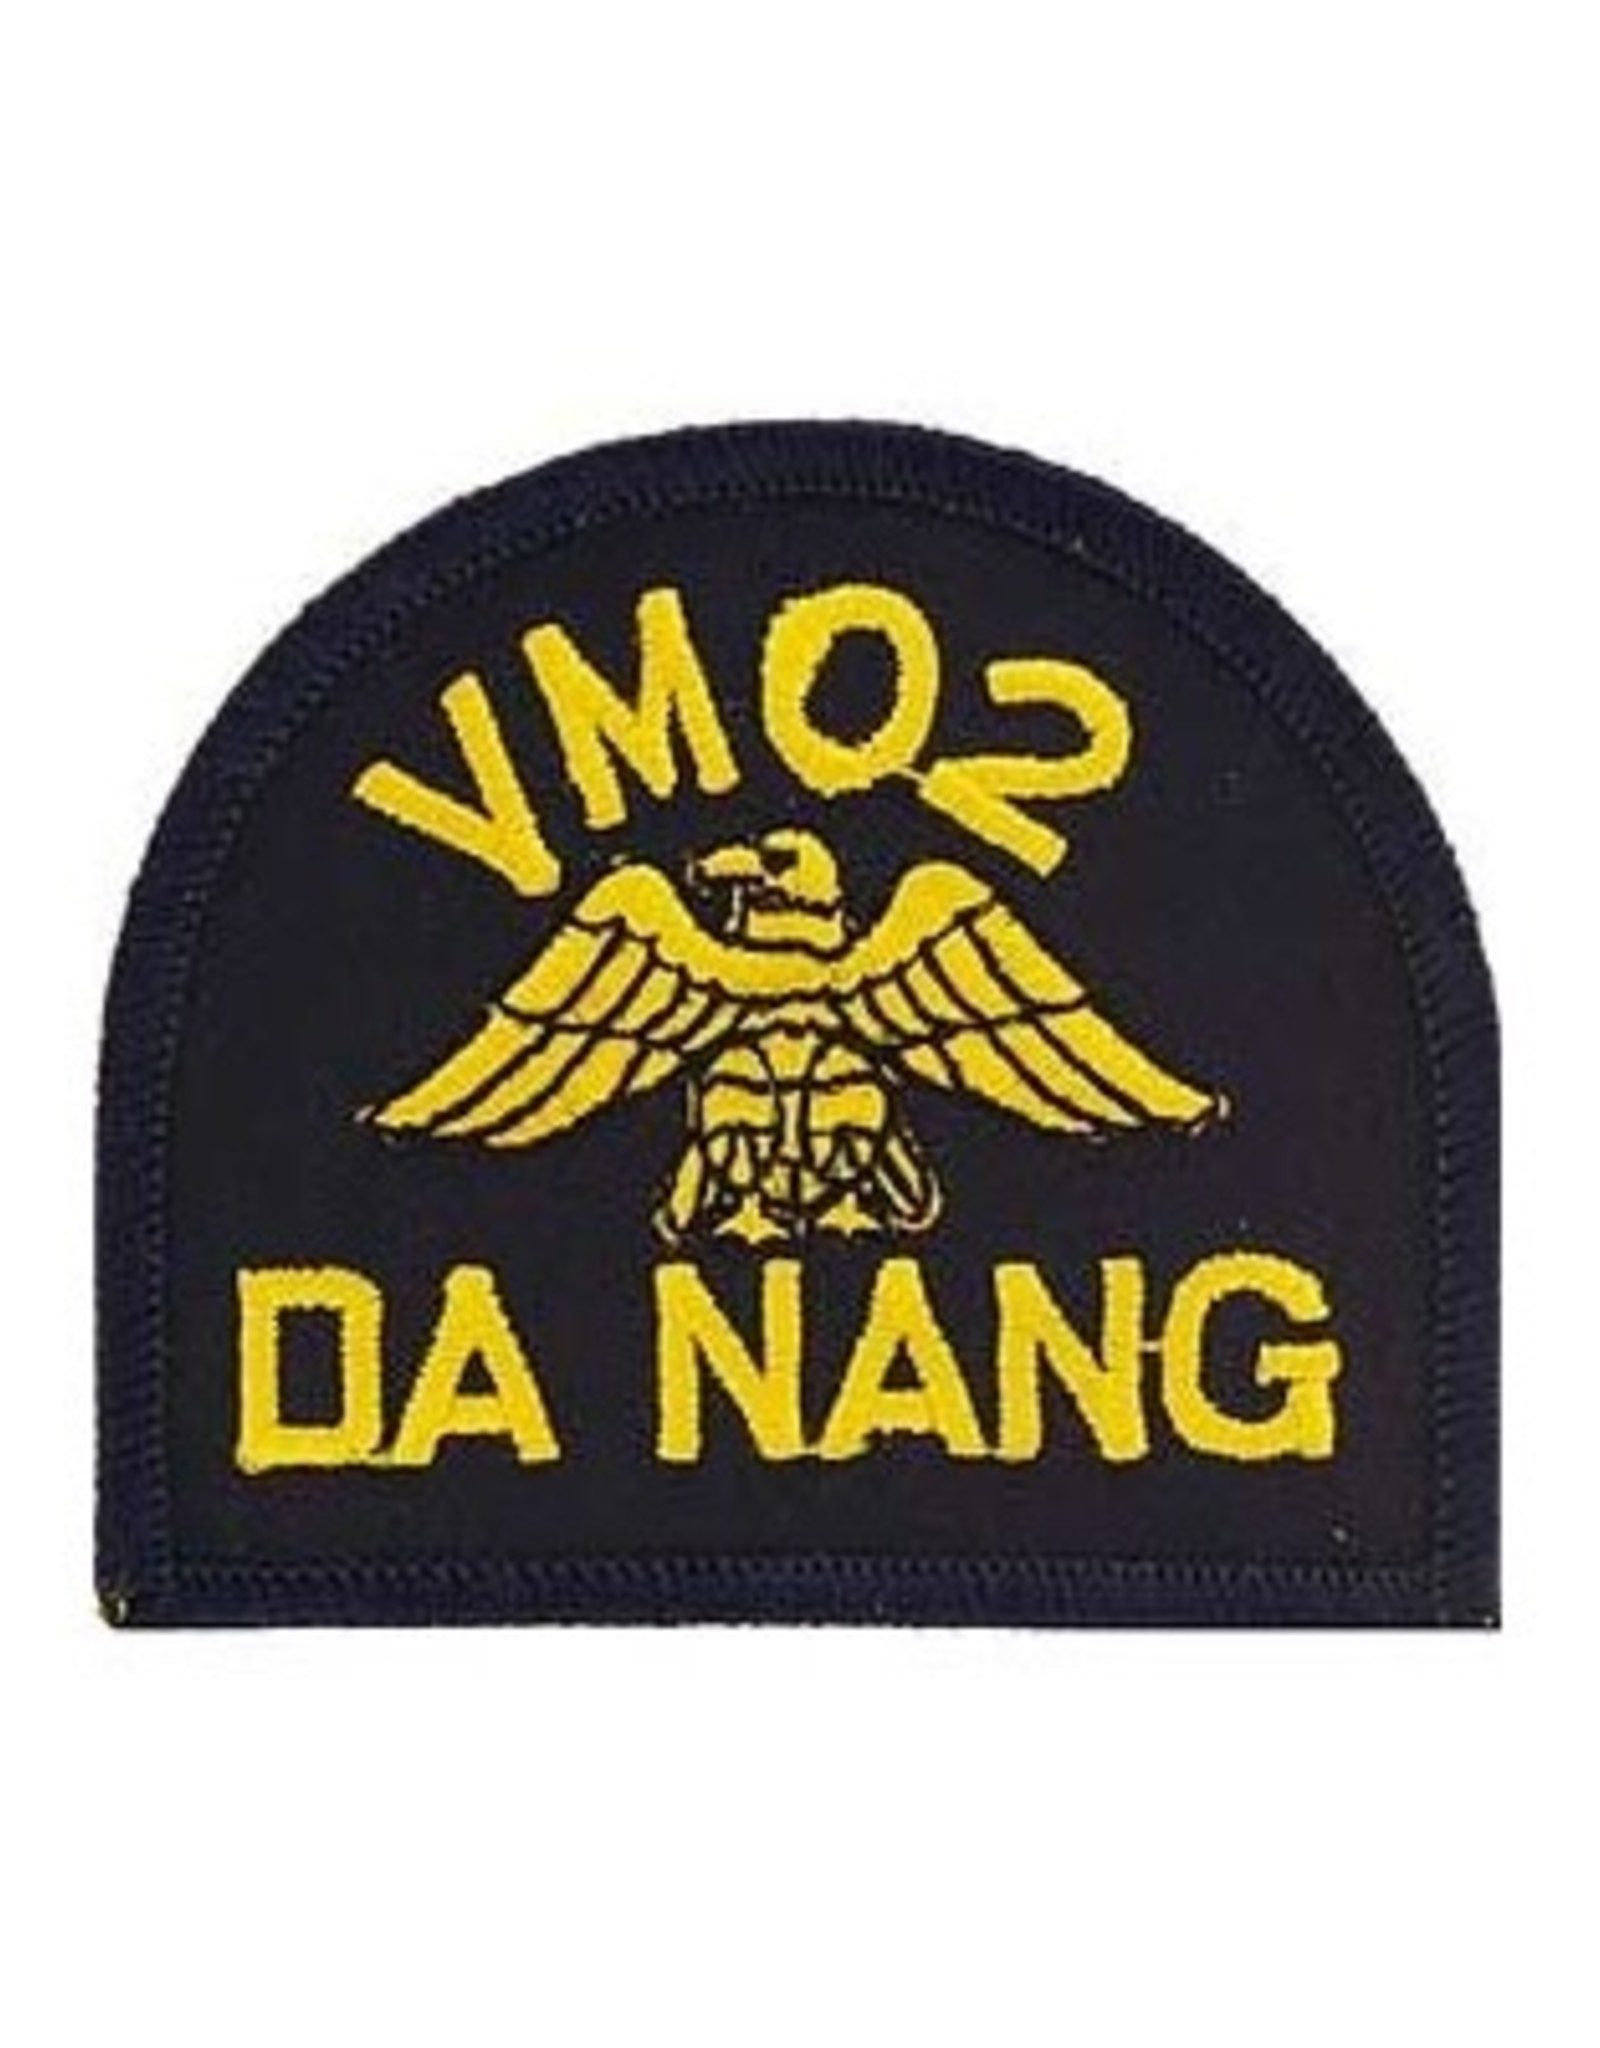 "MidMil Embroidered Navy VM02 Da Nang Vietnam 3"" wide x 2.6"" high Black"